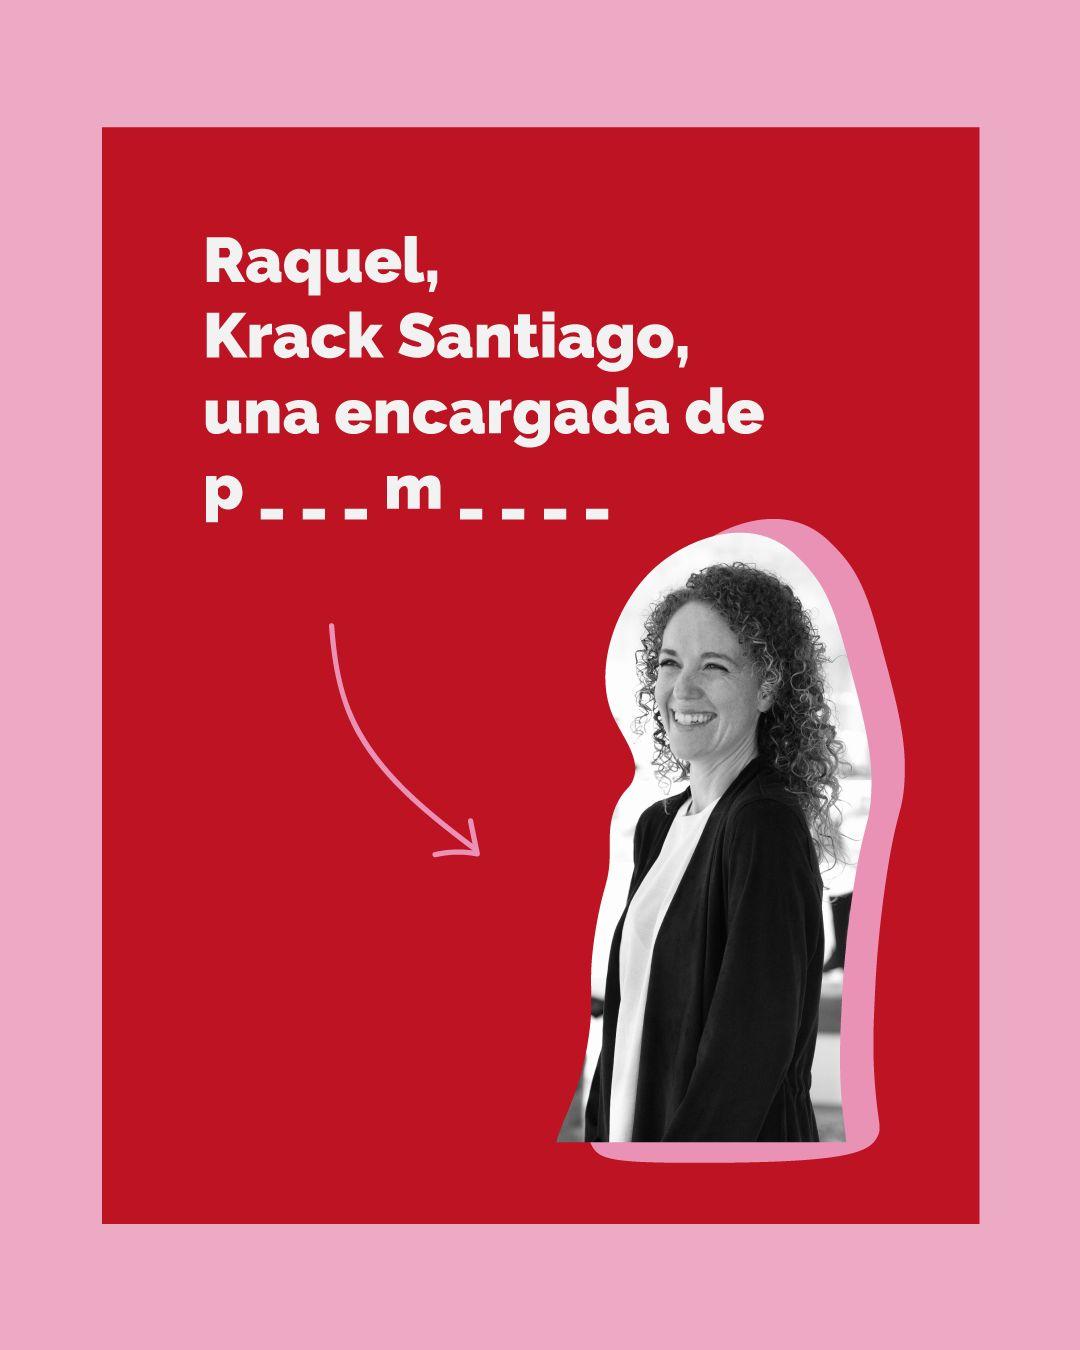 krack-empleada-santiago